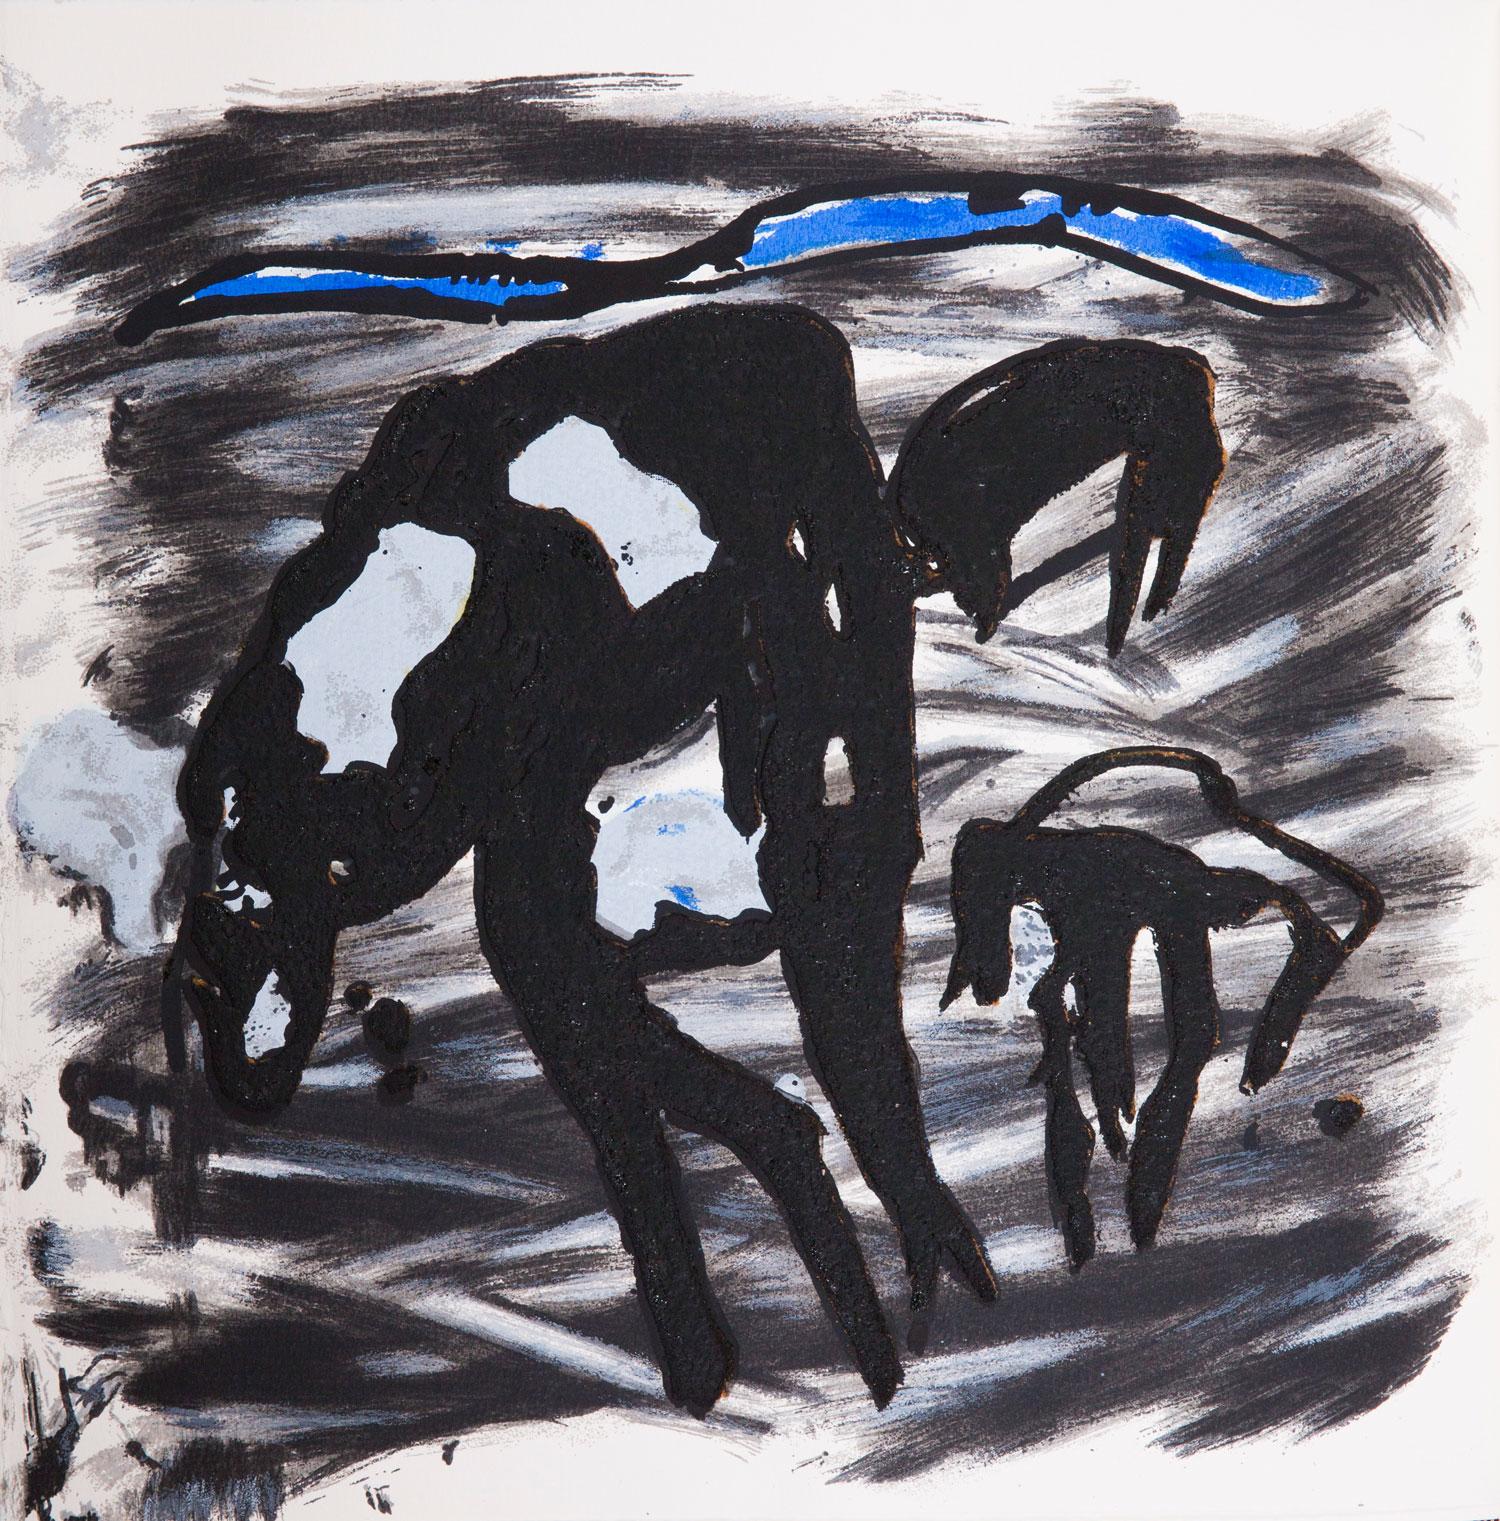 Emil Schumacher Grafik, Genesis Blatt 14, 1999